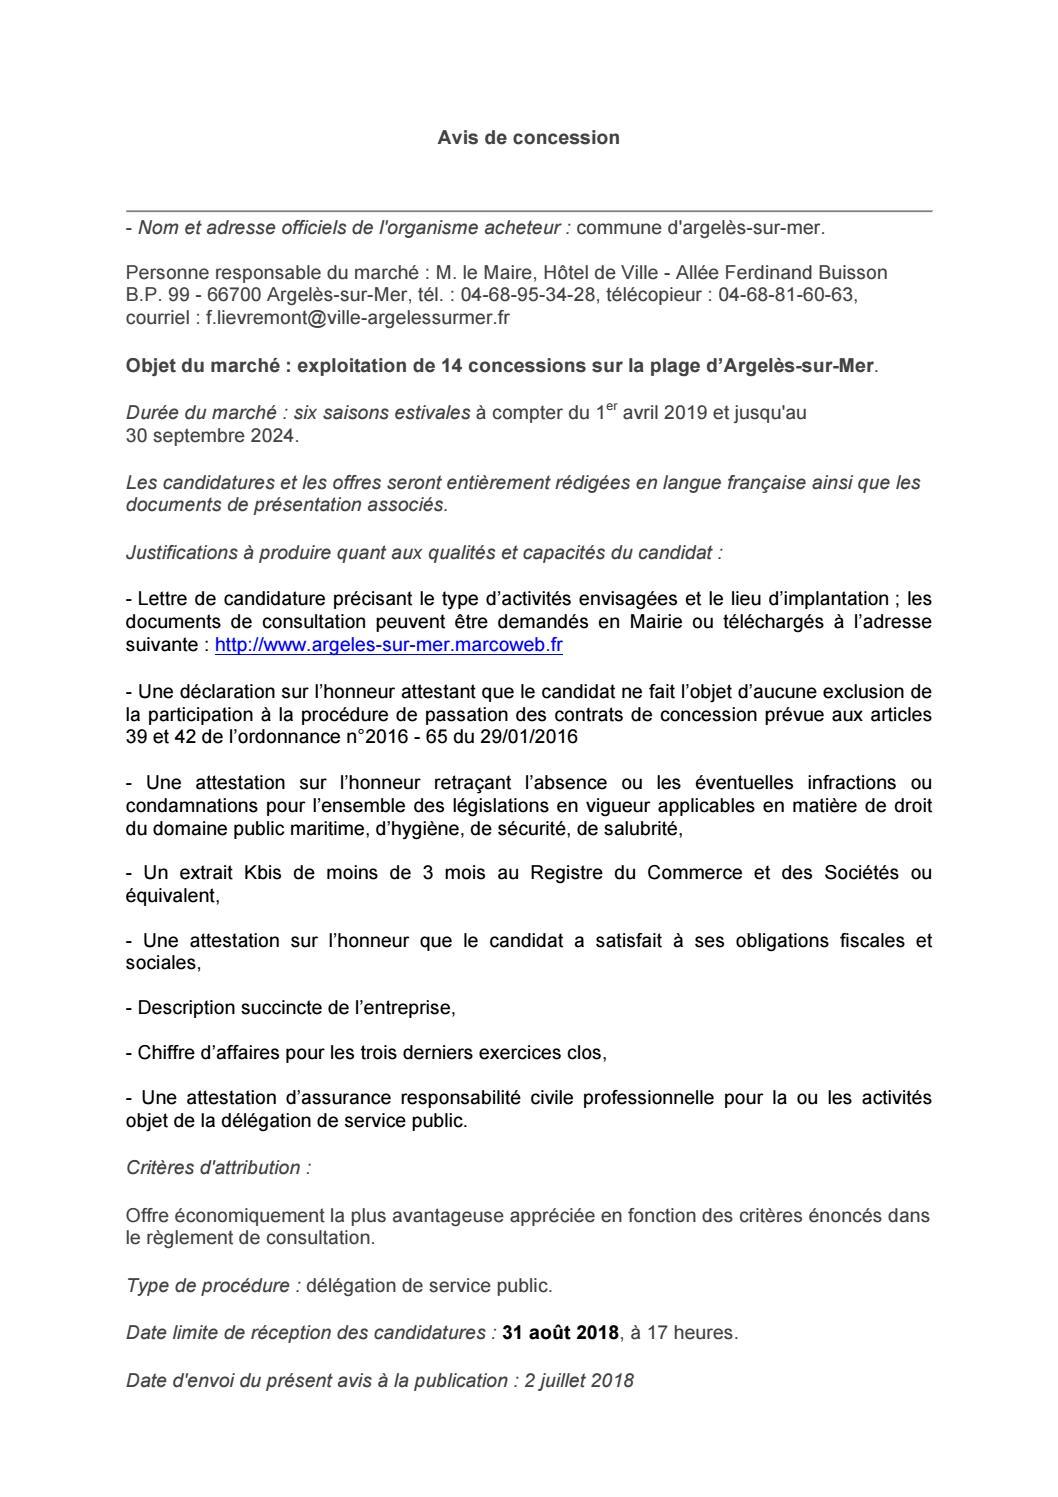 Avis De Consultation 2018 By Argeles Sur Mer Issuu